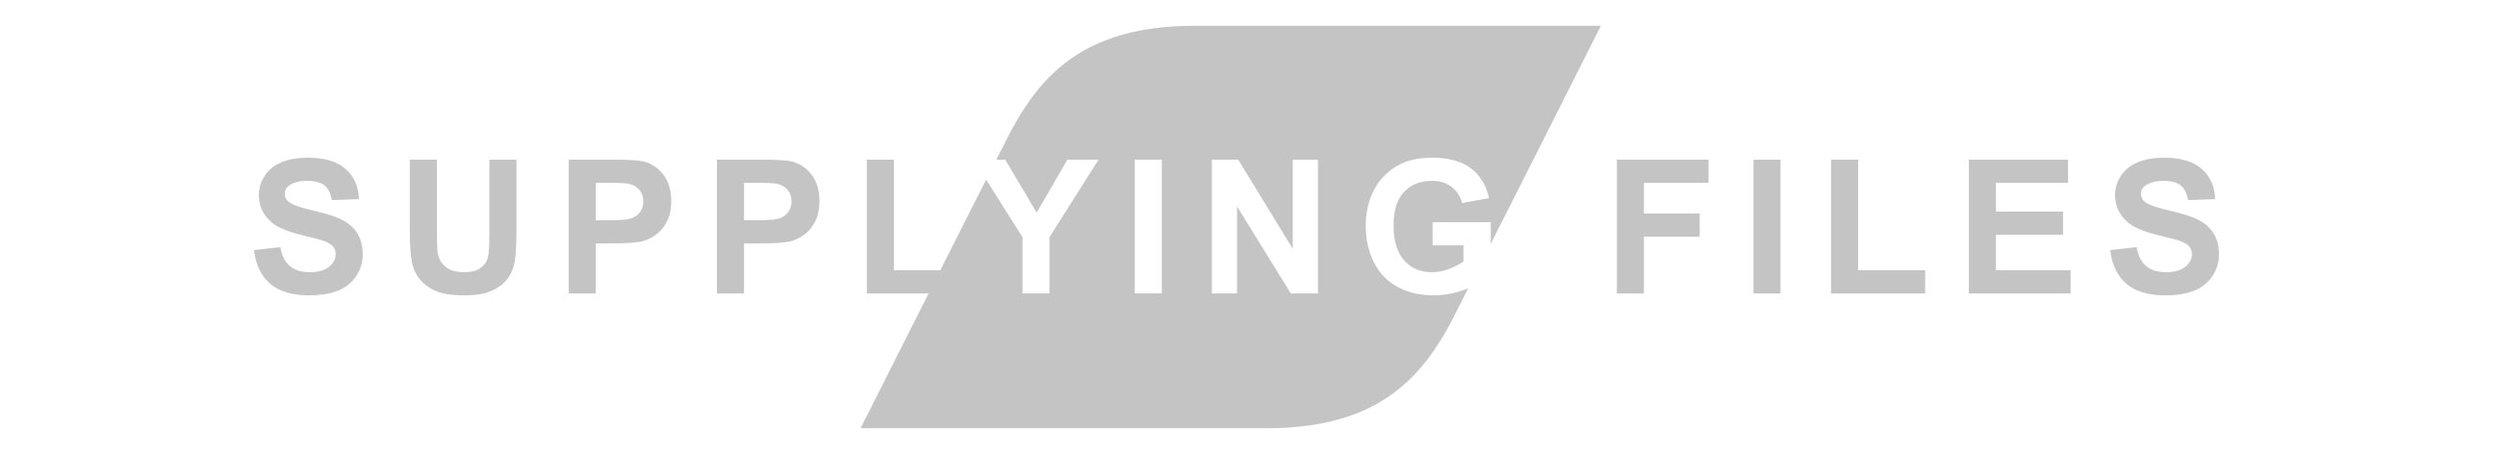 TRANNYS Nav Icon_Supplying Files_RGB Grey 1.jpg